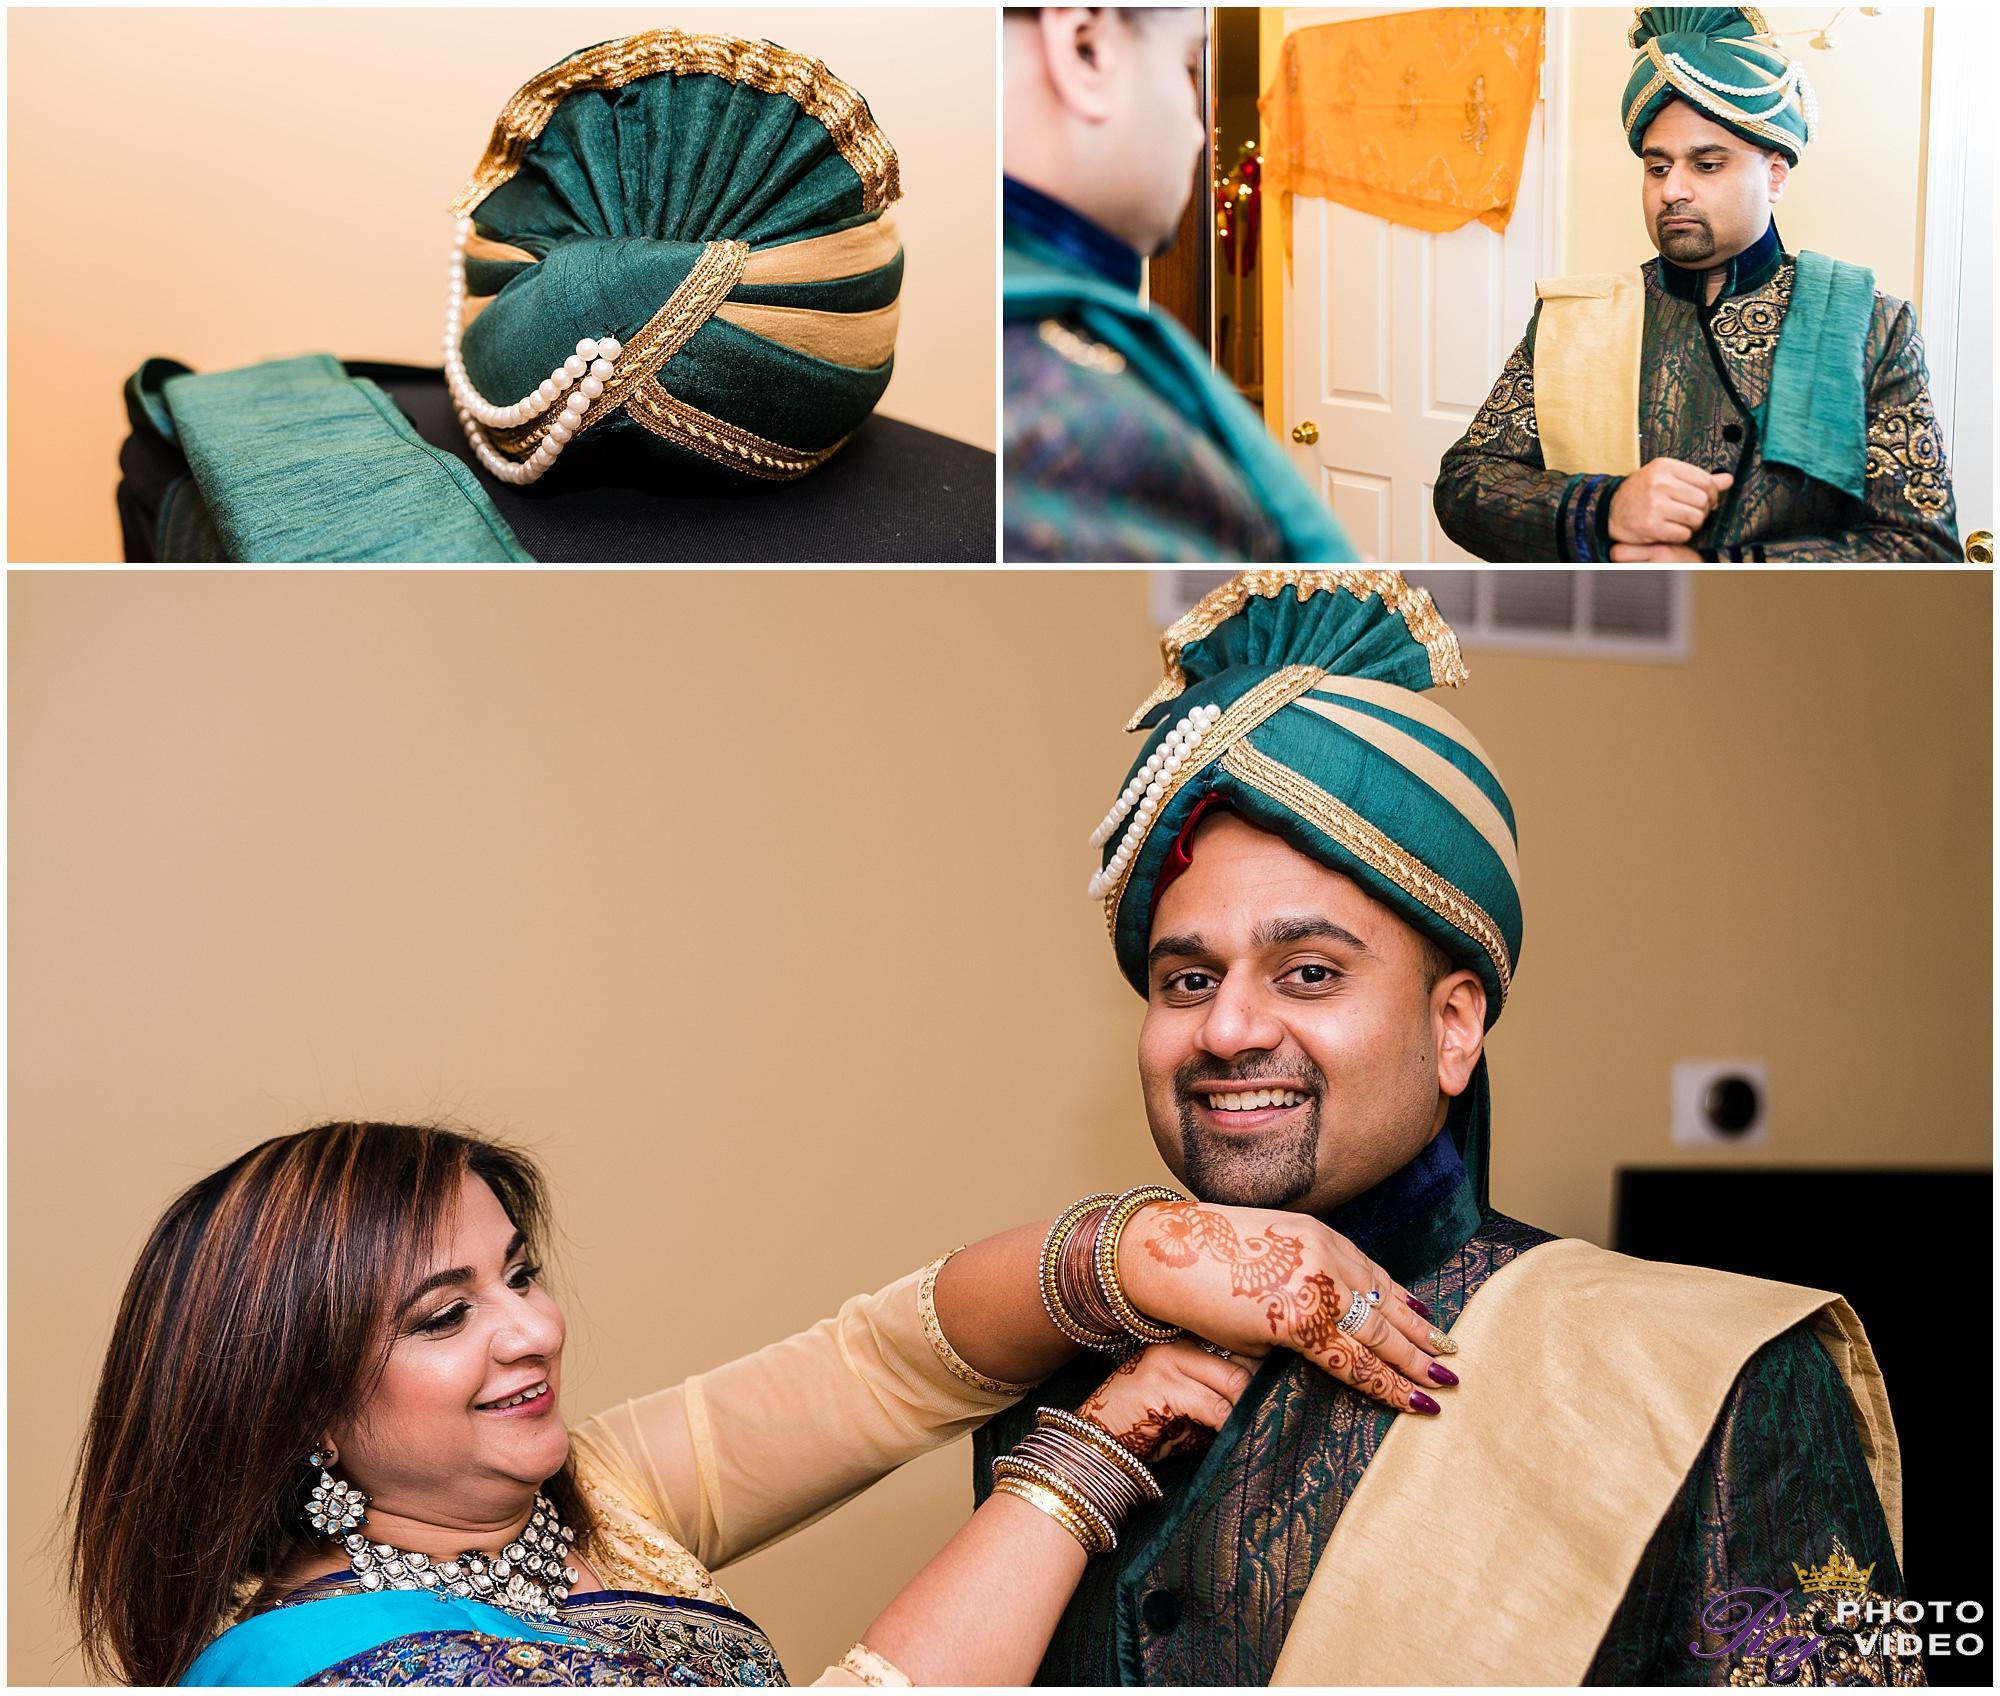 Sri-Guruvaayoorappan-Temple-Marlboro-NJ-Indian-Wedding-Chiyomi-Scott-00001.jpg